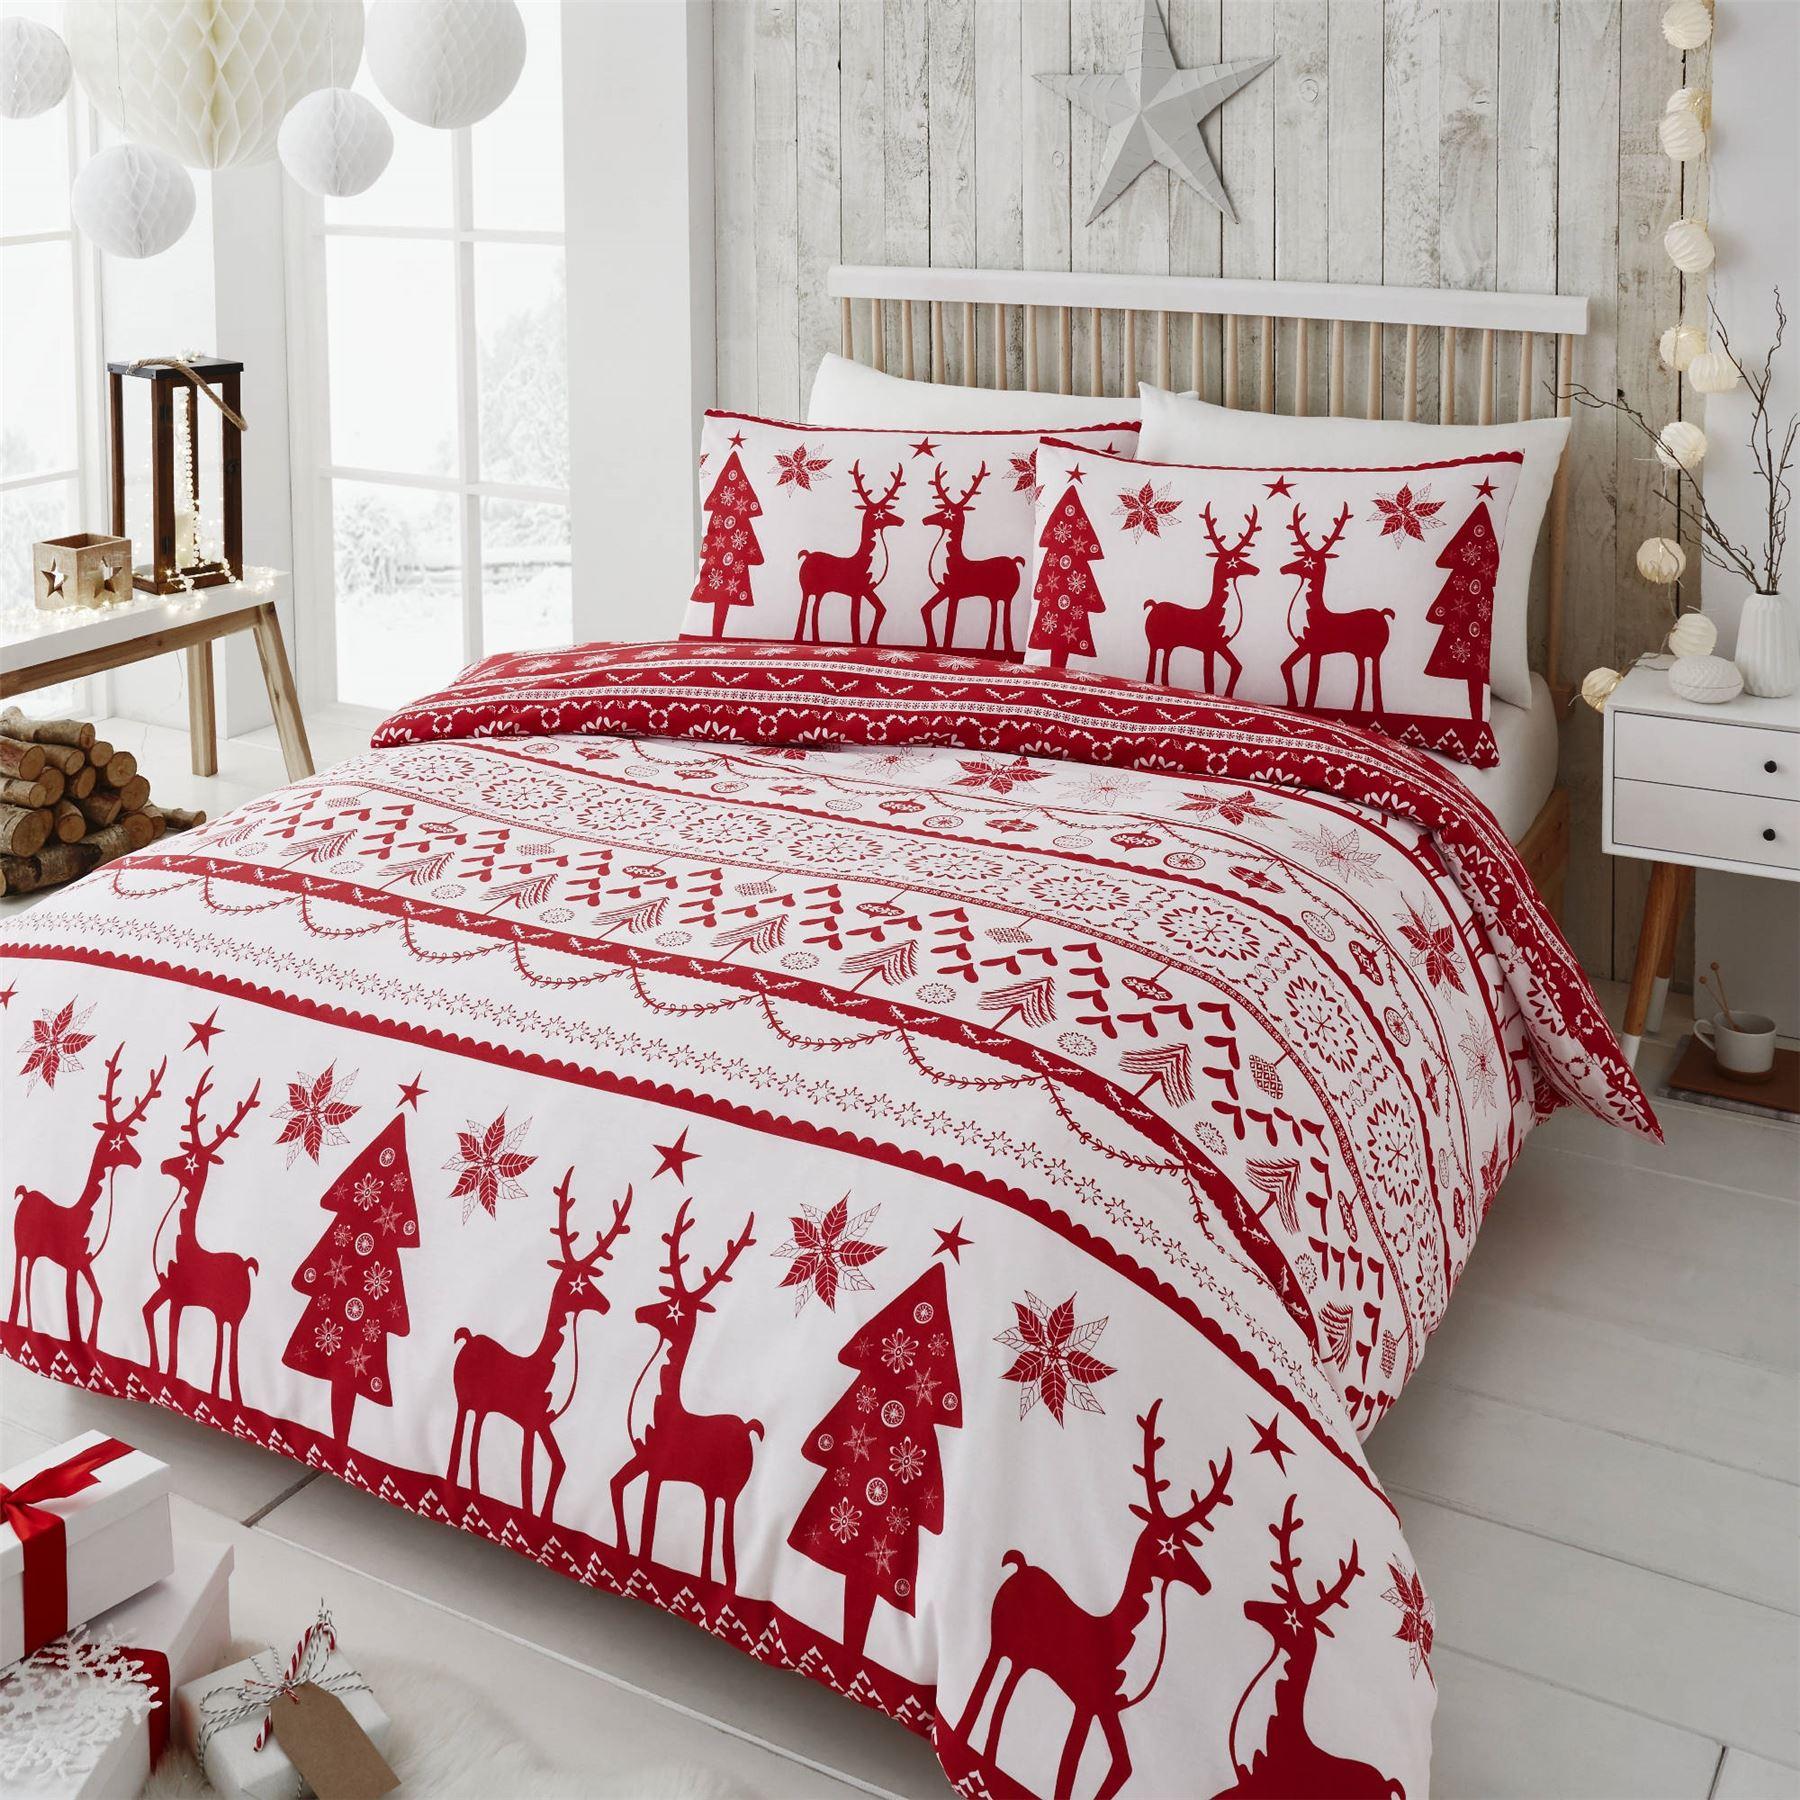 Christmas Bed Linen Sets Part - 34: Happy-Linen-Co-Festive-Scandi-Nordic-Christmas-Duvet-